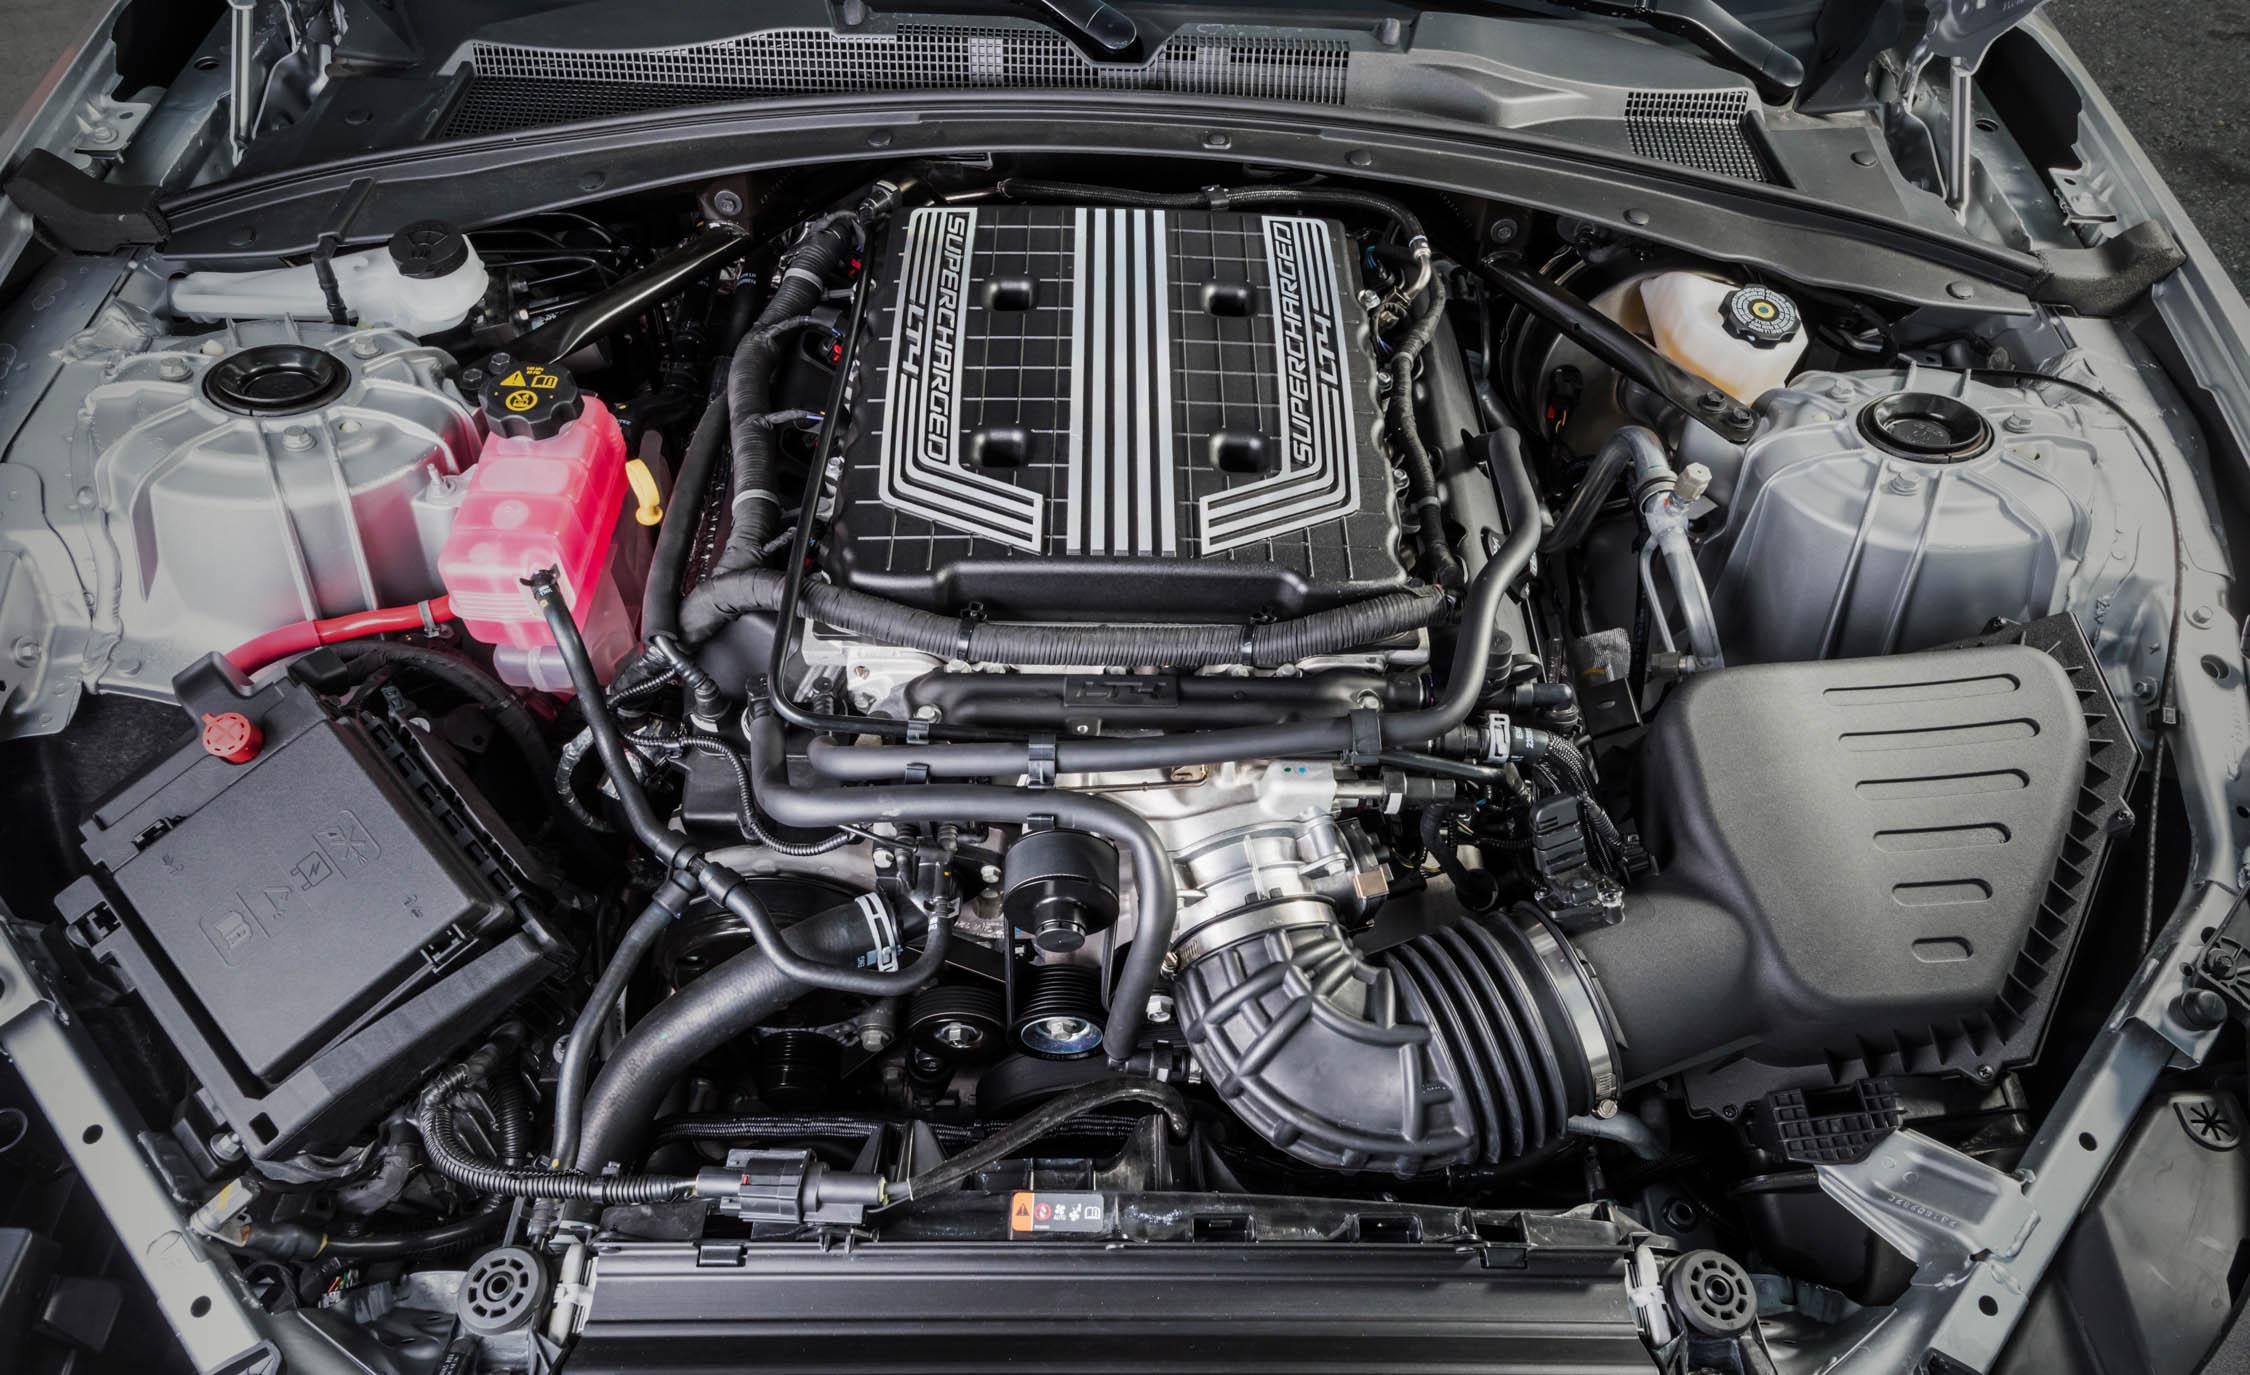 2017 Chevrolet Camaro ZL1 coupe supercharged 6.2-liter V-8 engin